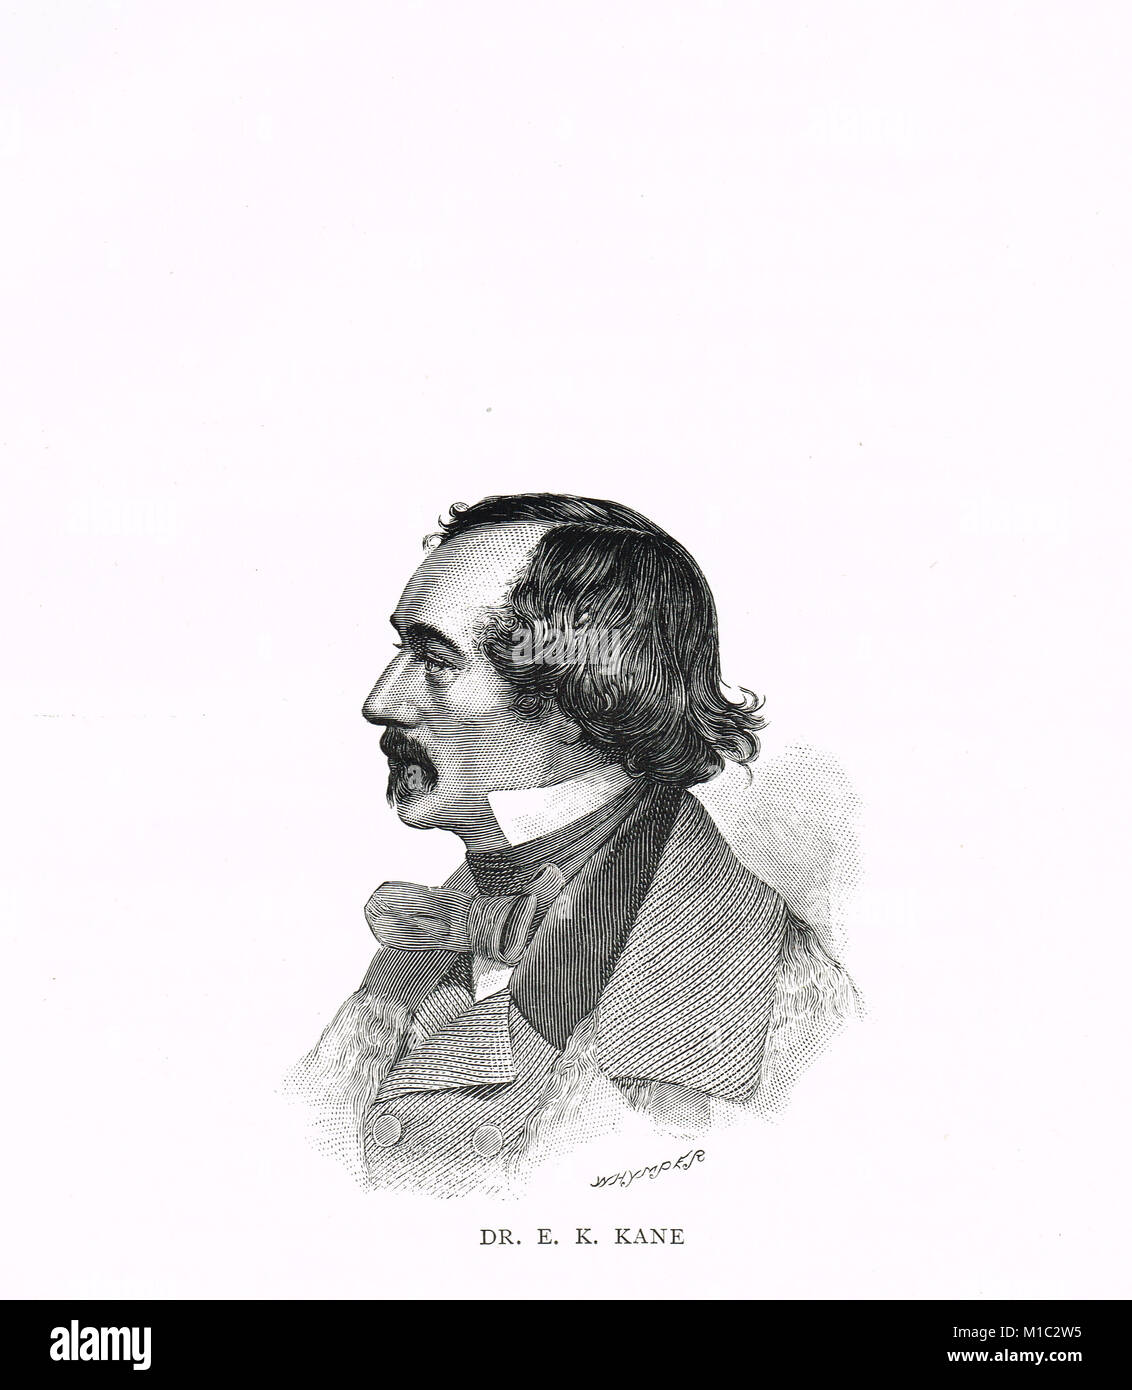 Dr Elisha Kent Kane, American Arctic explorer, 1820-1857 - Stock Image